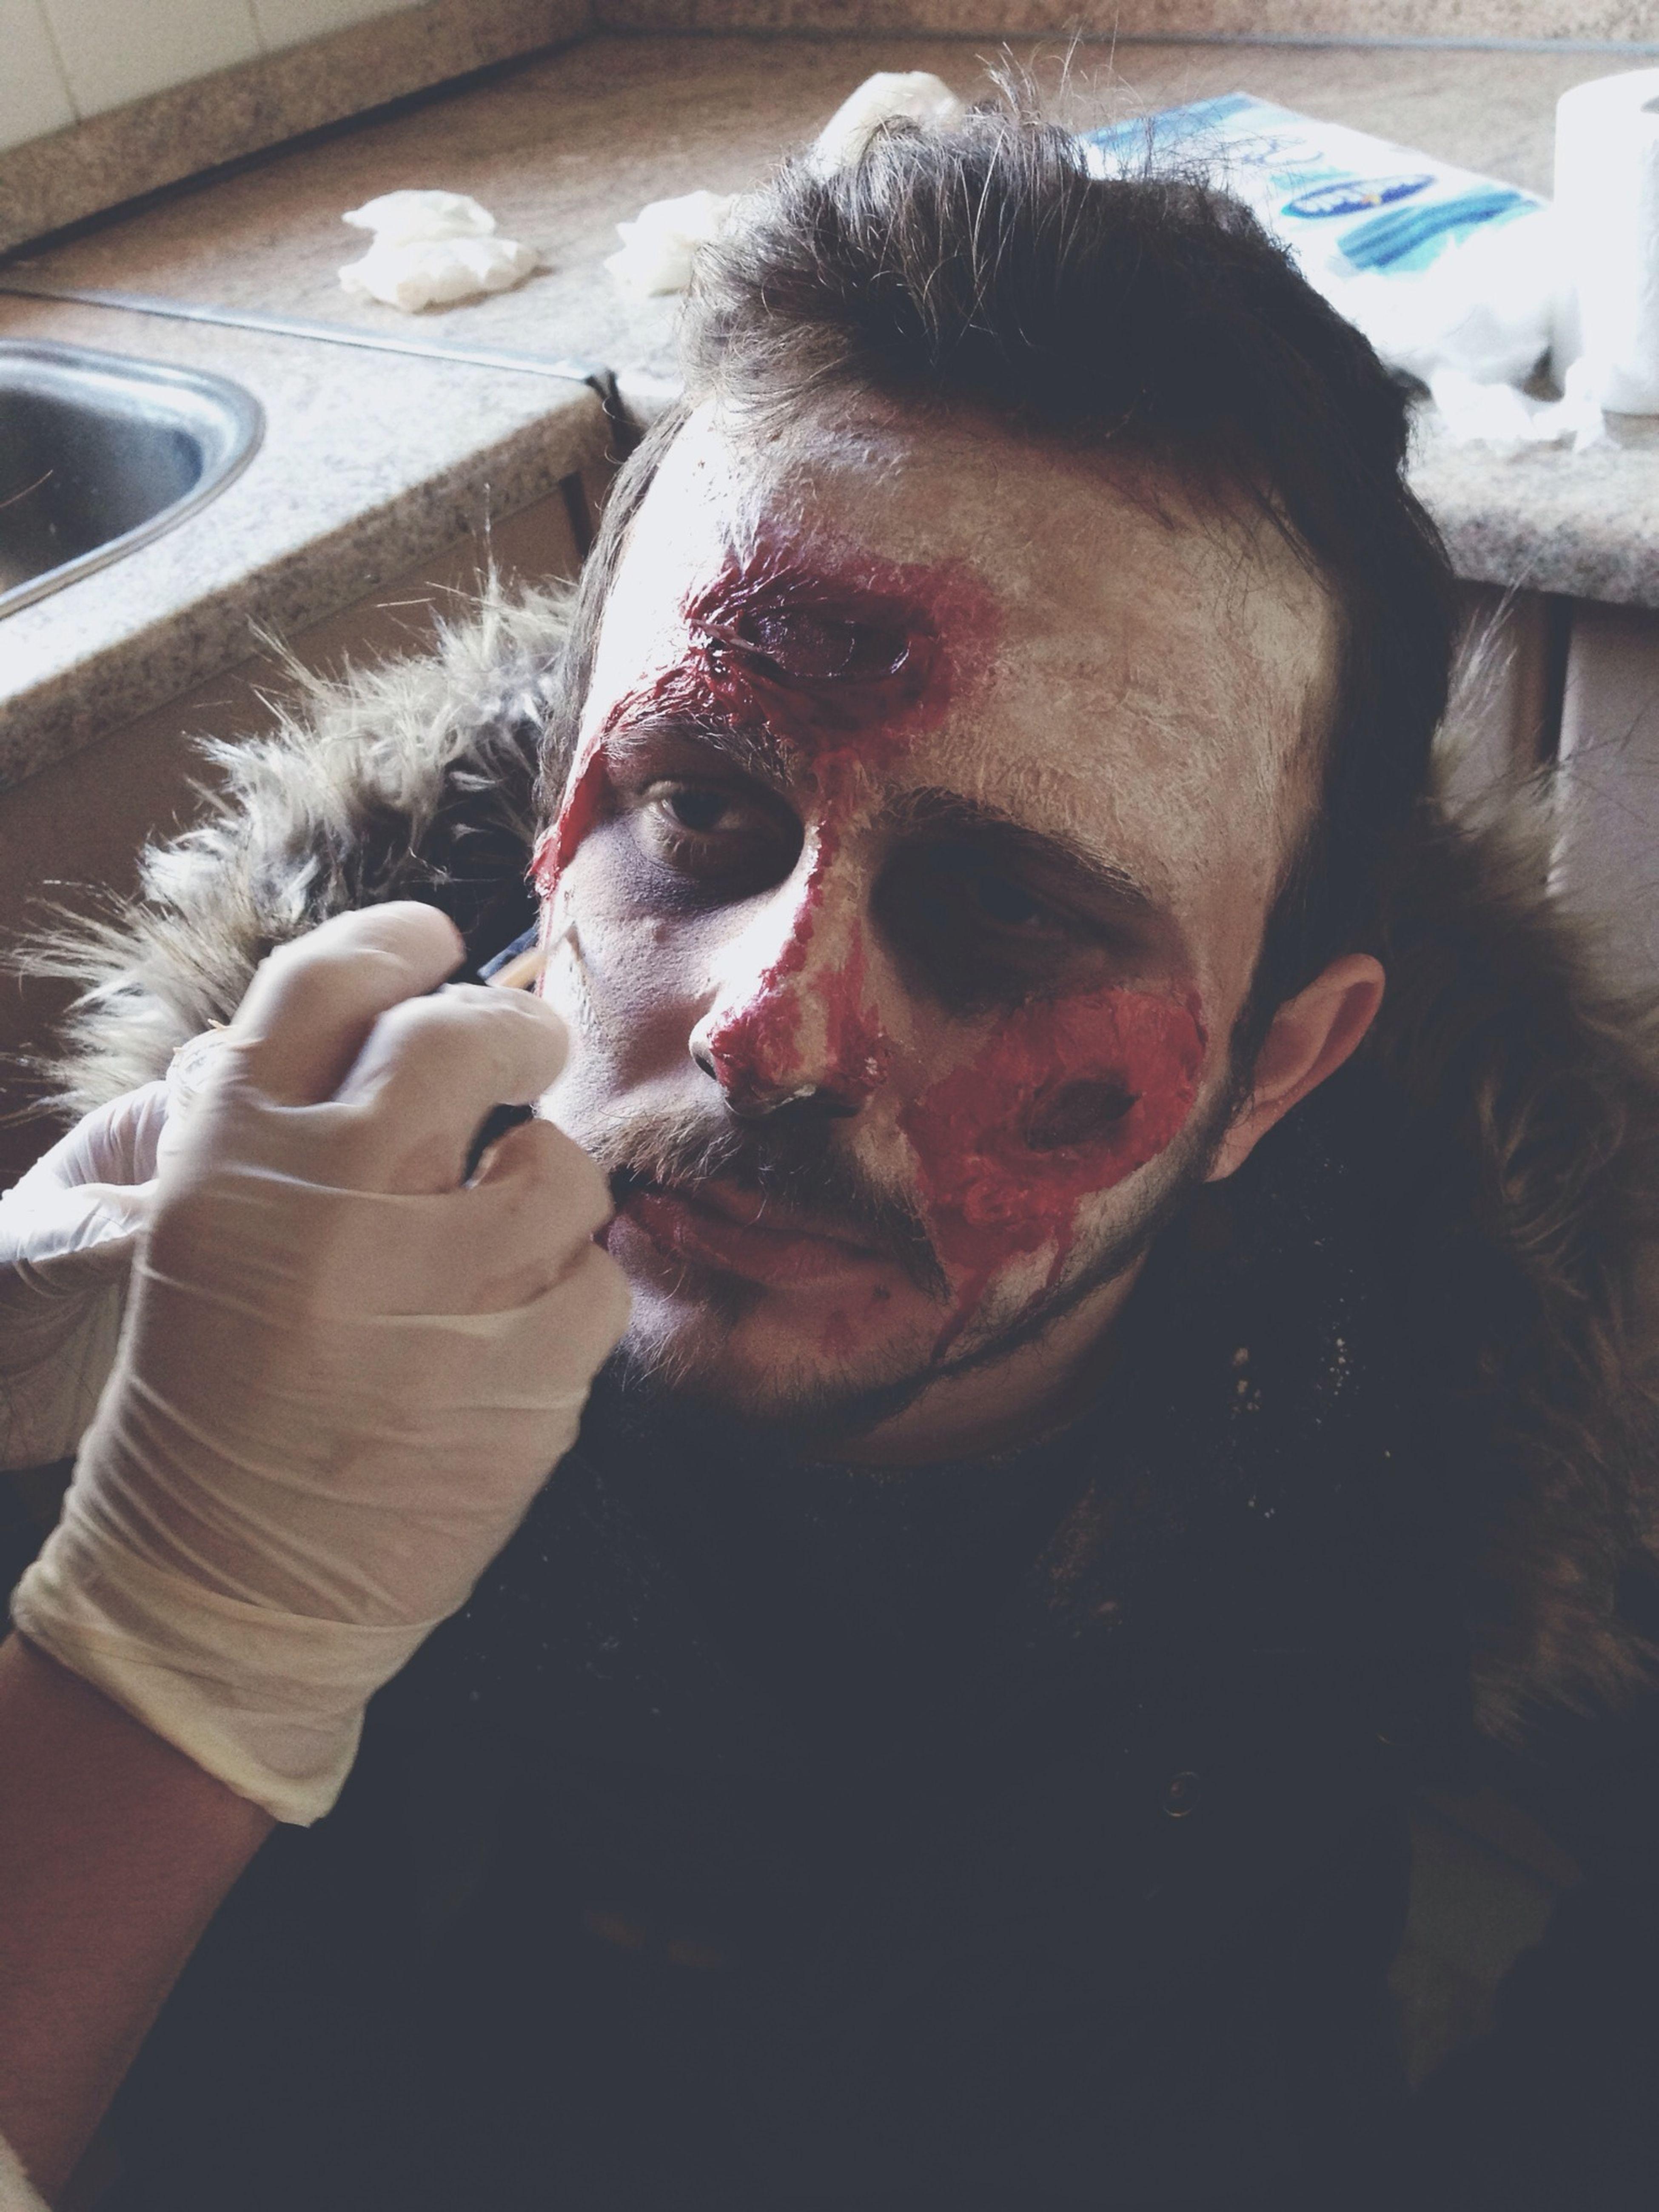 Zombie Film Perdearkası Set Behindthescene Shooting Apocalypse Heyula Makeup Makyaj